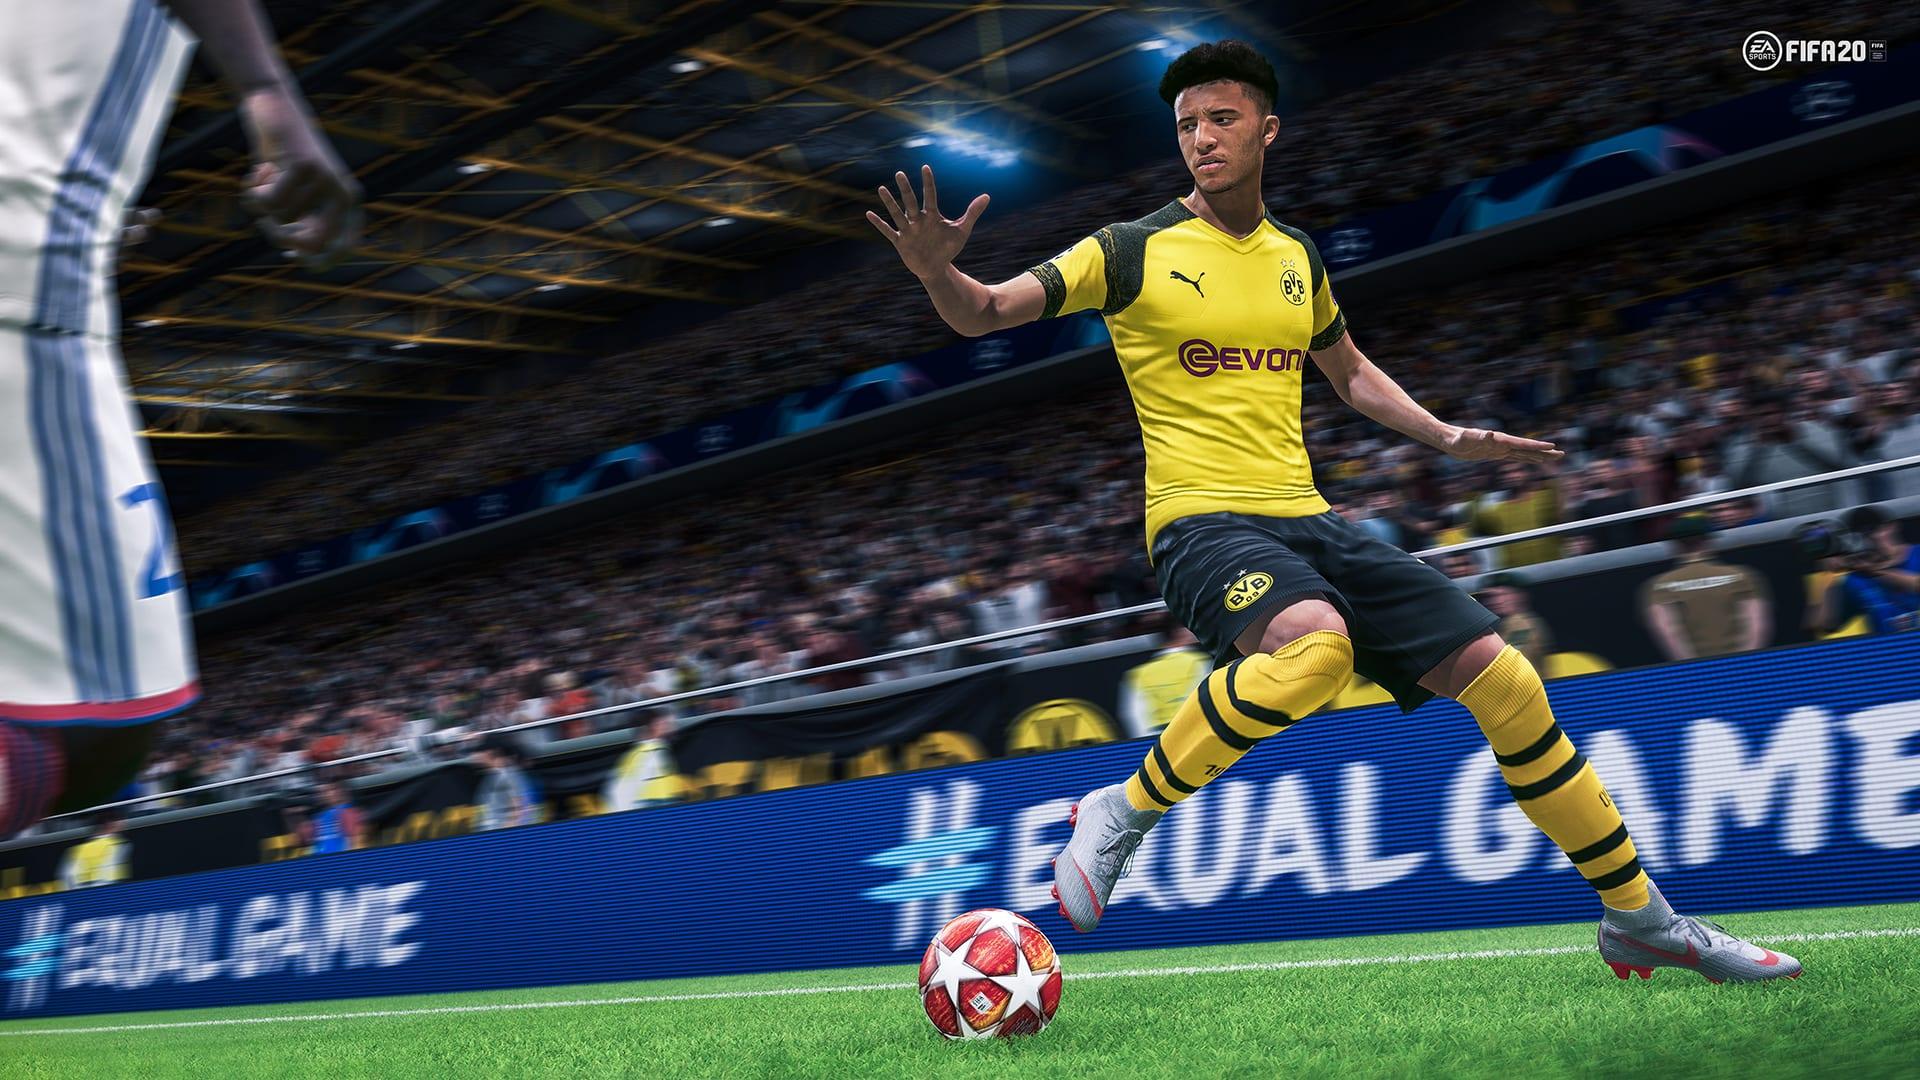 Fifa 20 Demo update